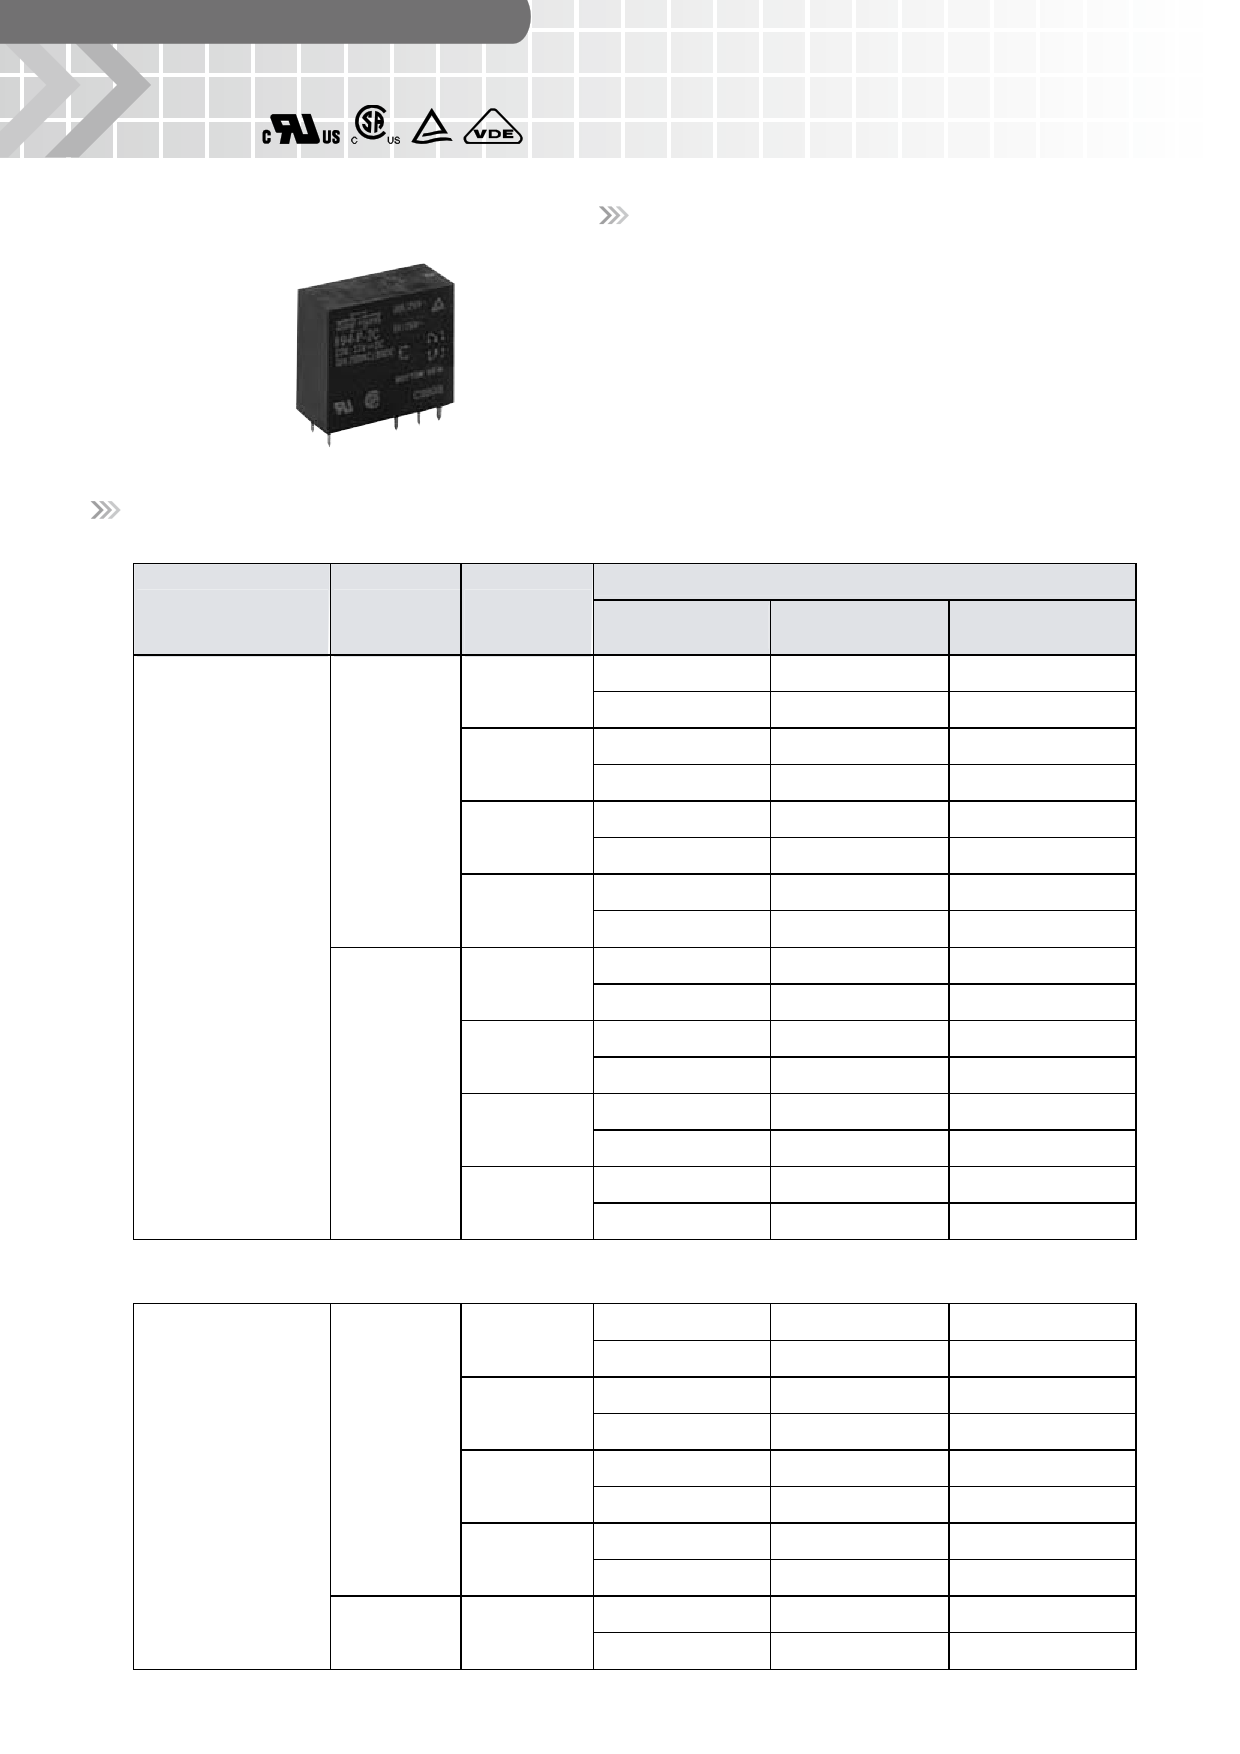 894-2ACA2-F-C Datasheet, 894-2ACA2-F-C PDF,ピン配置, 機能